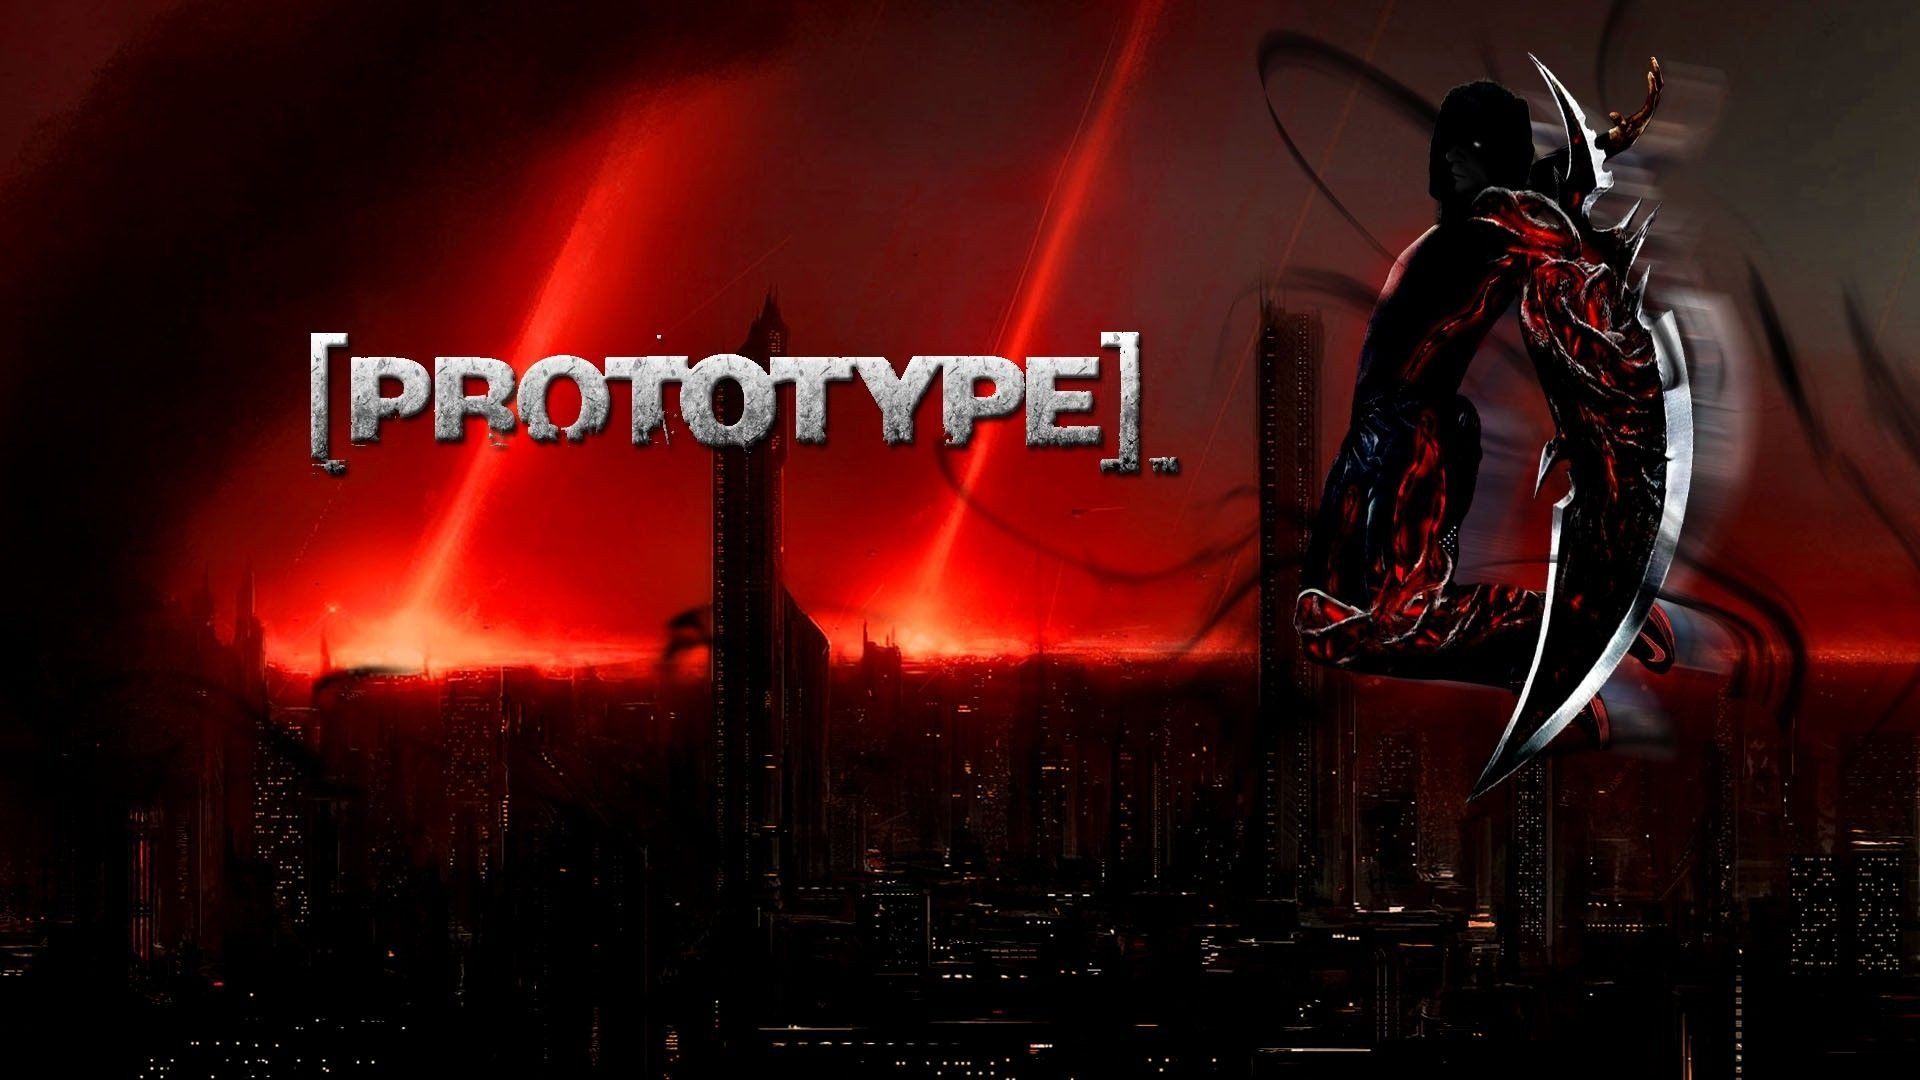 Prototype 3 release date